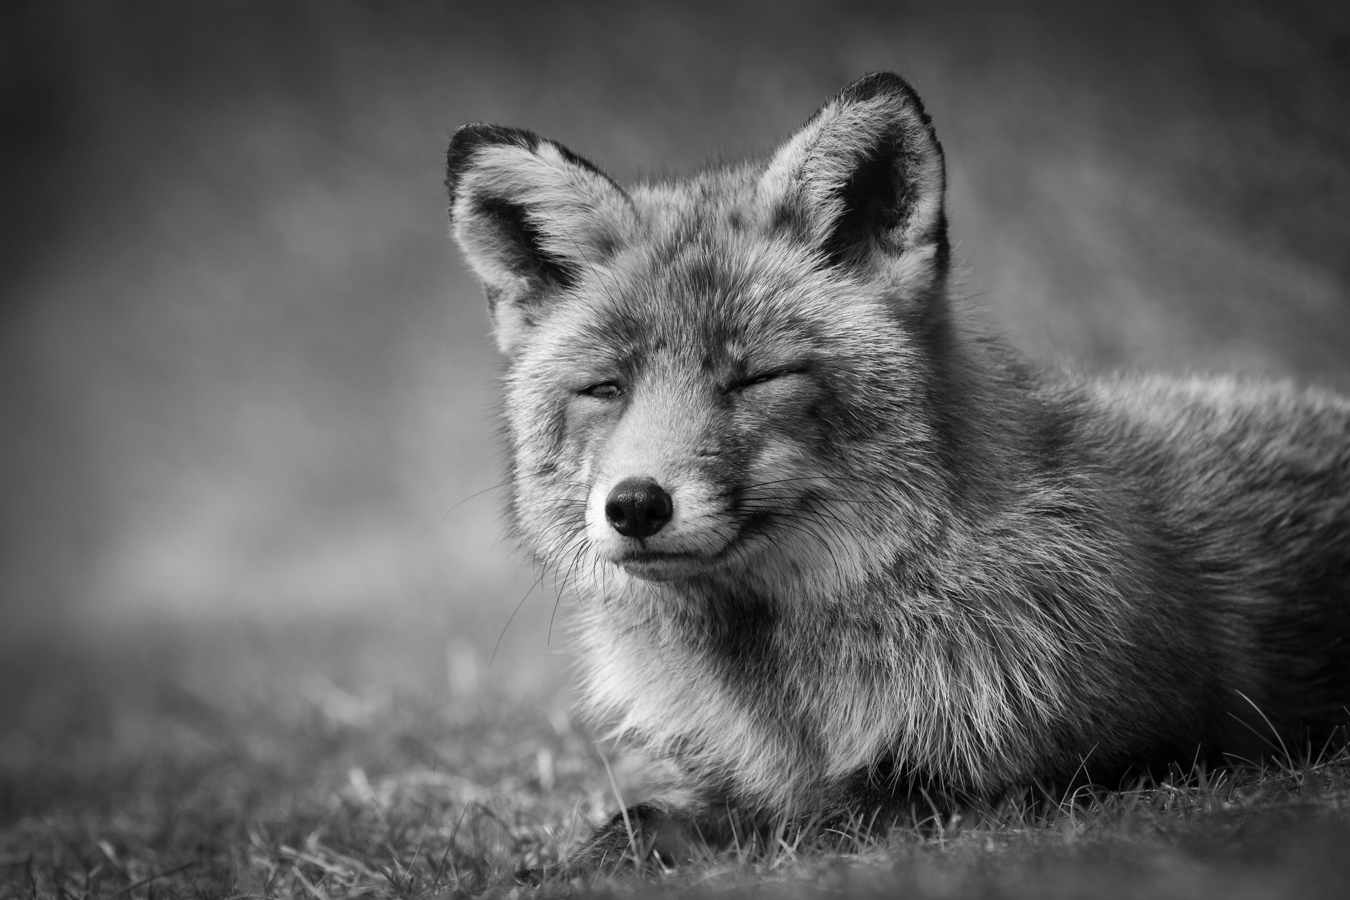 Fox run - bnw, blackandwhite, photography - roelvdw   ello